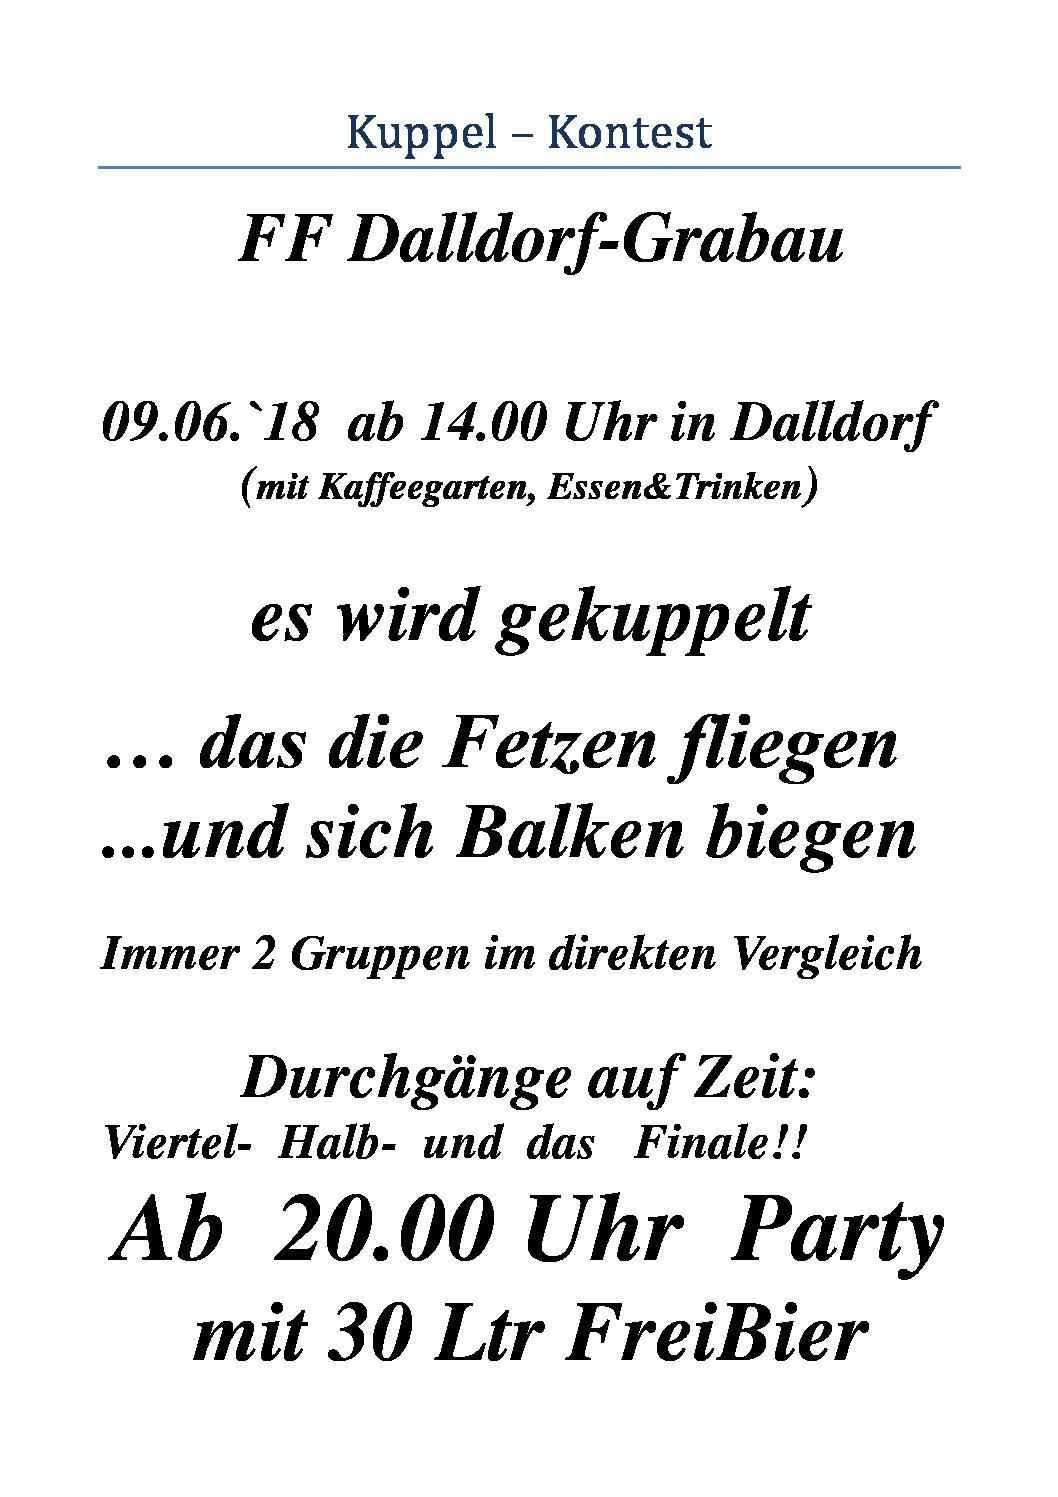 Kuppel-Kontest der FF Dalldorf-Grabau